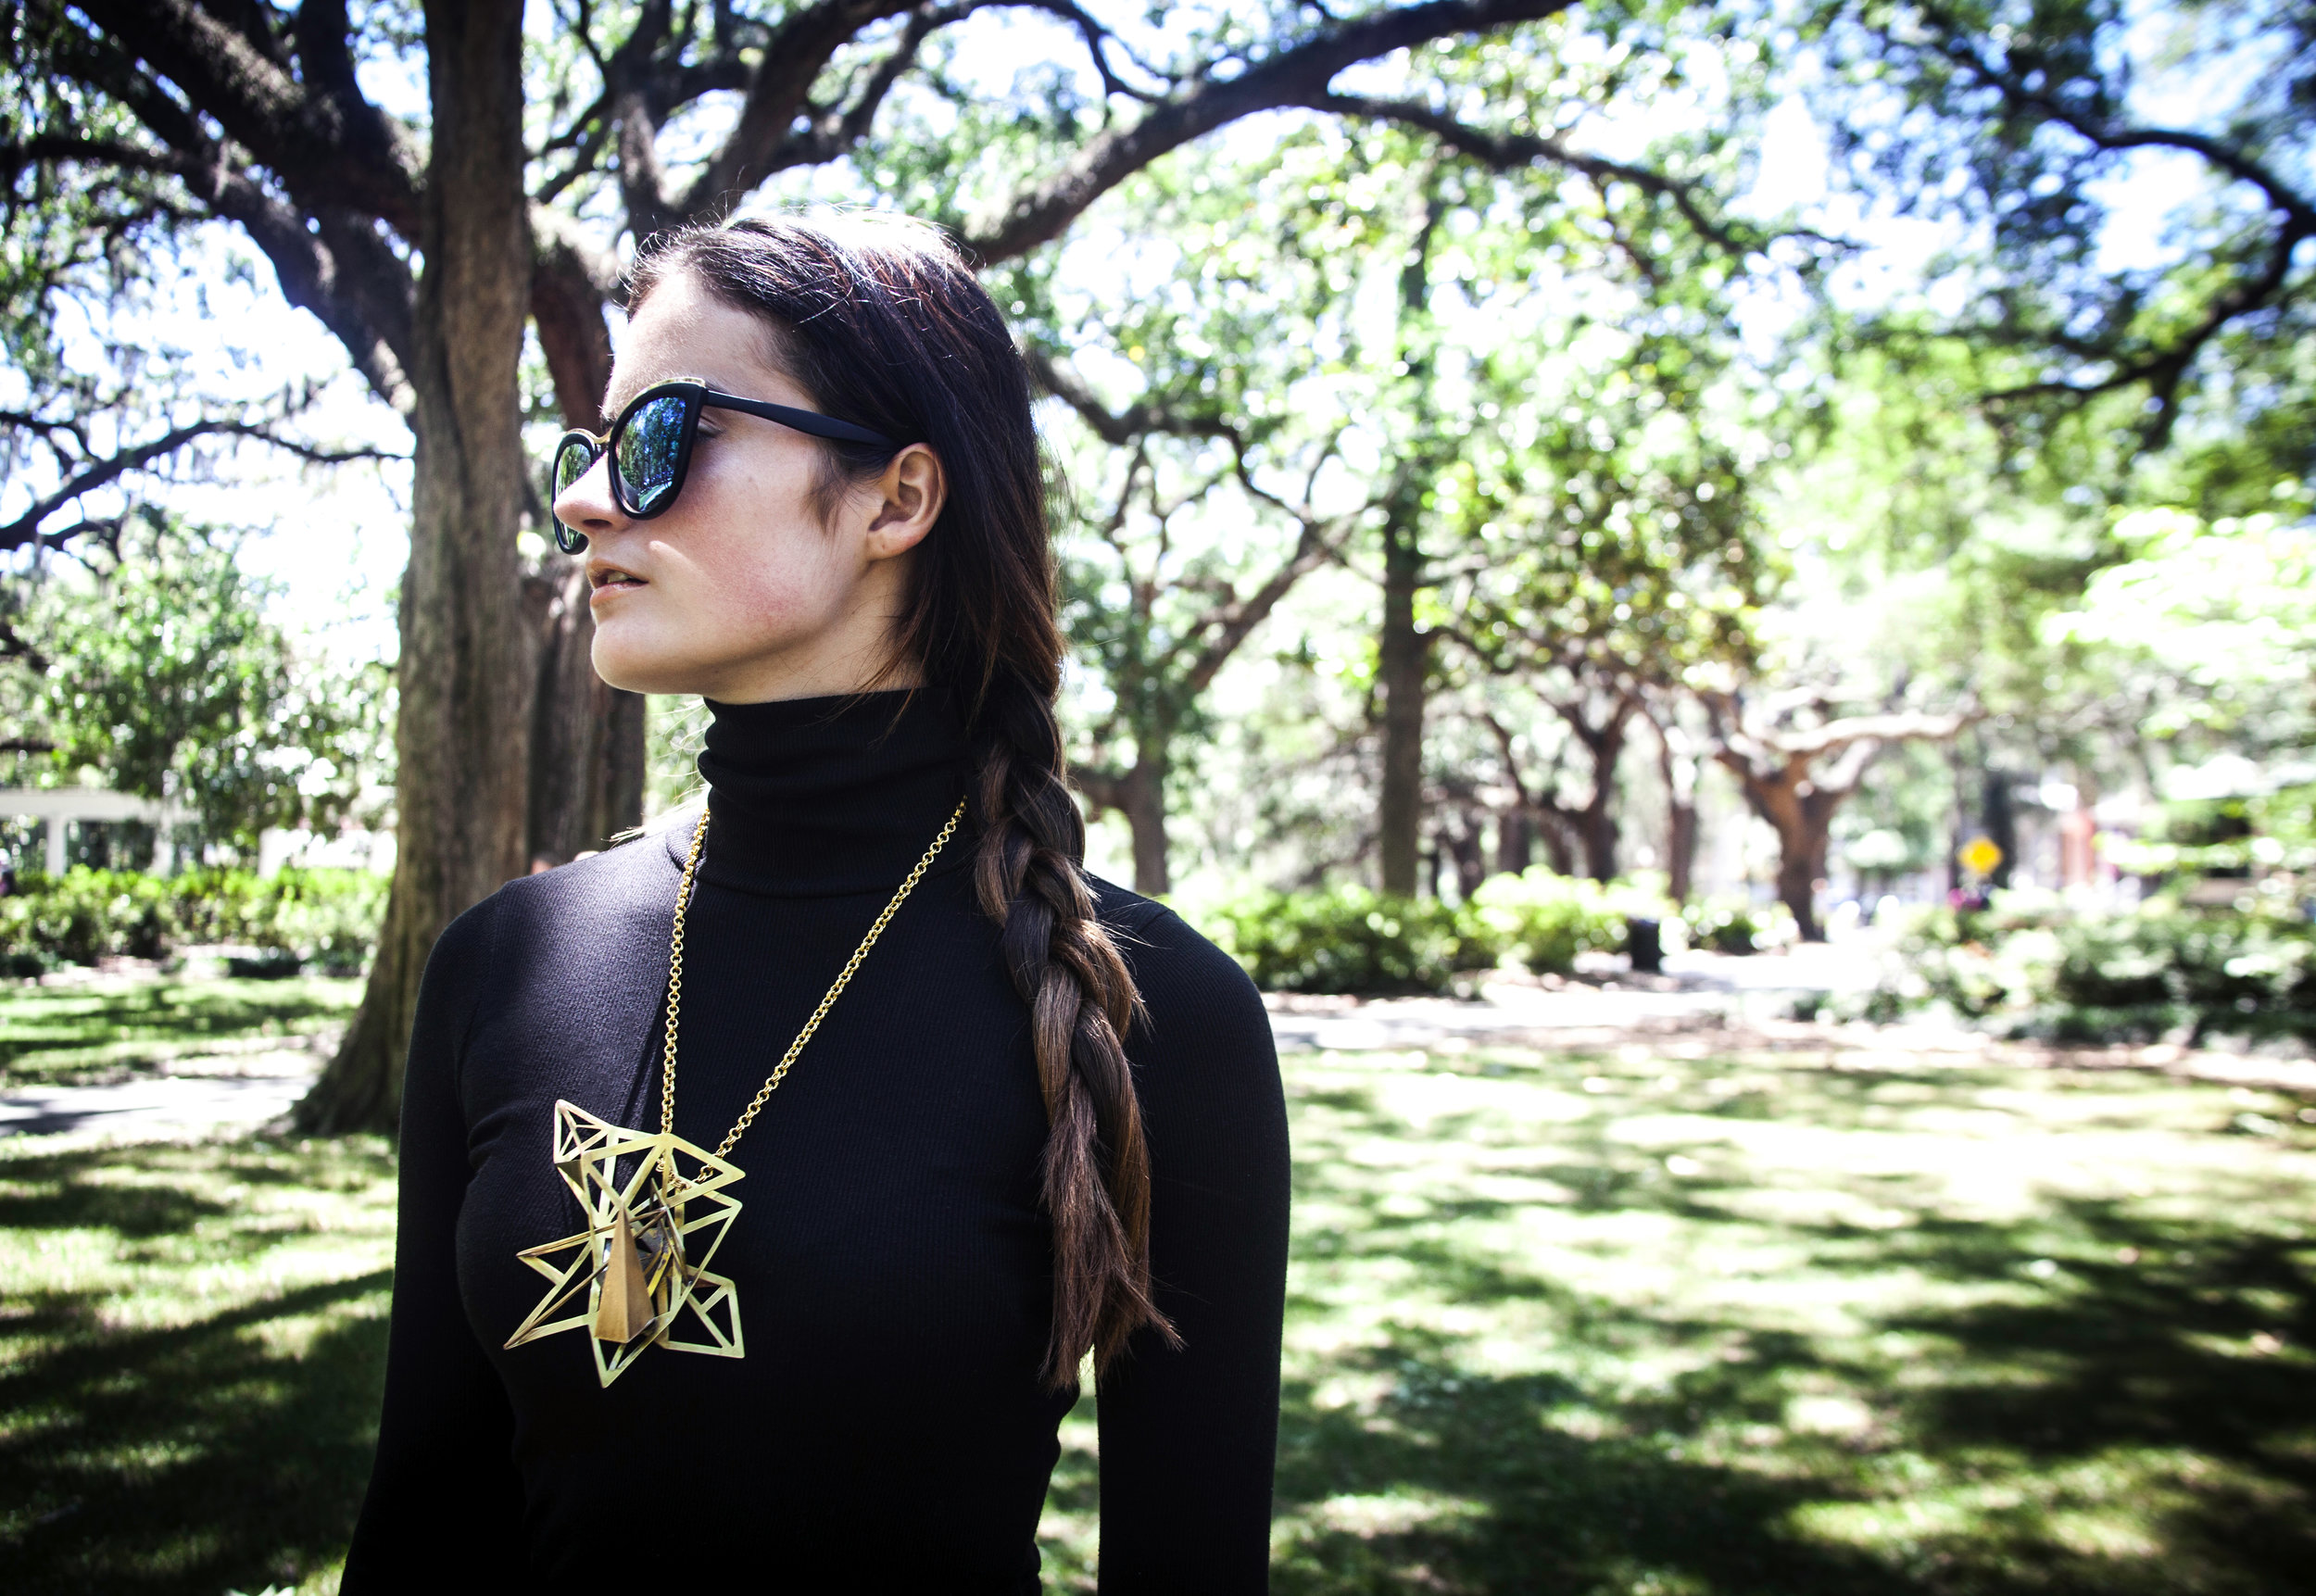 Model: Lexi Bright